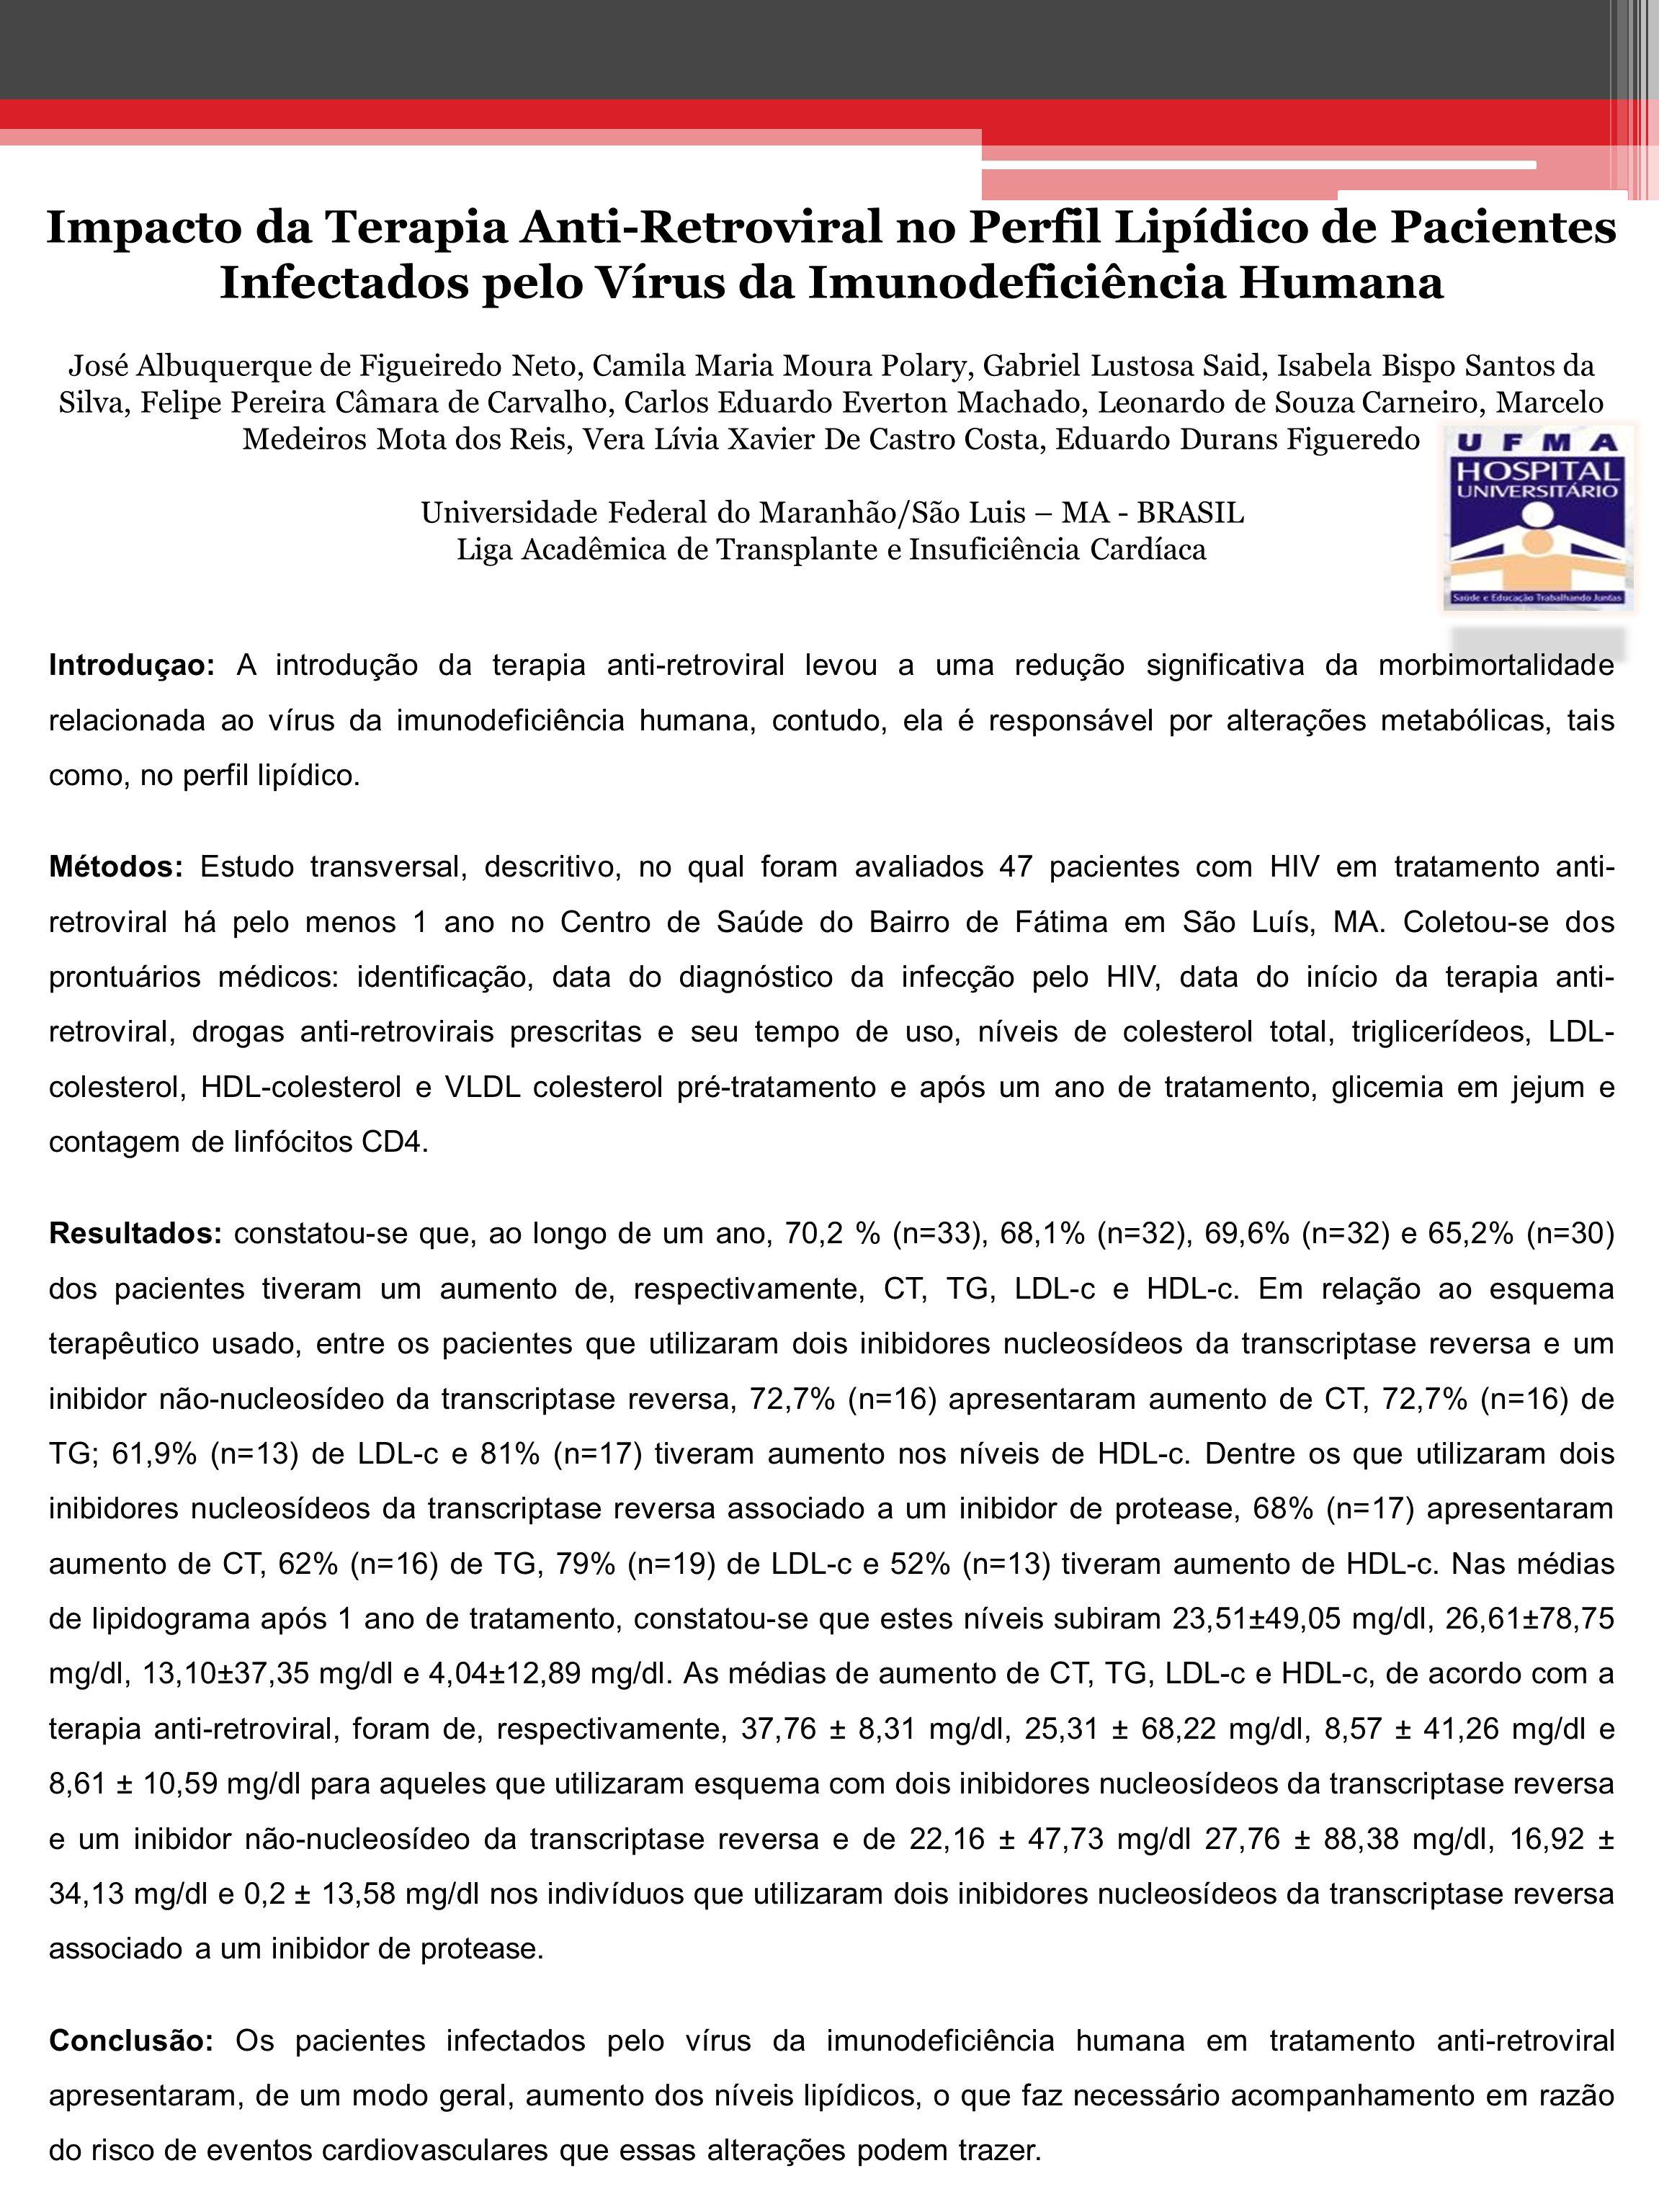 Impacto da Terapia Anti-Retroviral no Perfil Lipídico de Pacientes Infectados pelo Vírus da Imunodeficiência Humana José Albuquerque de Figueiredo Net